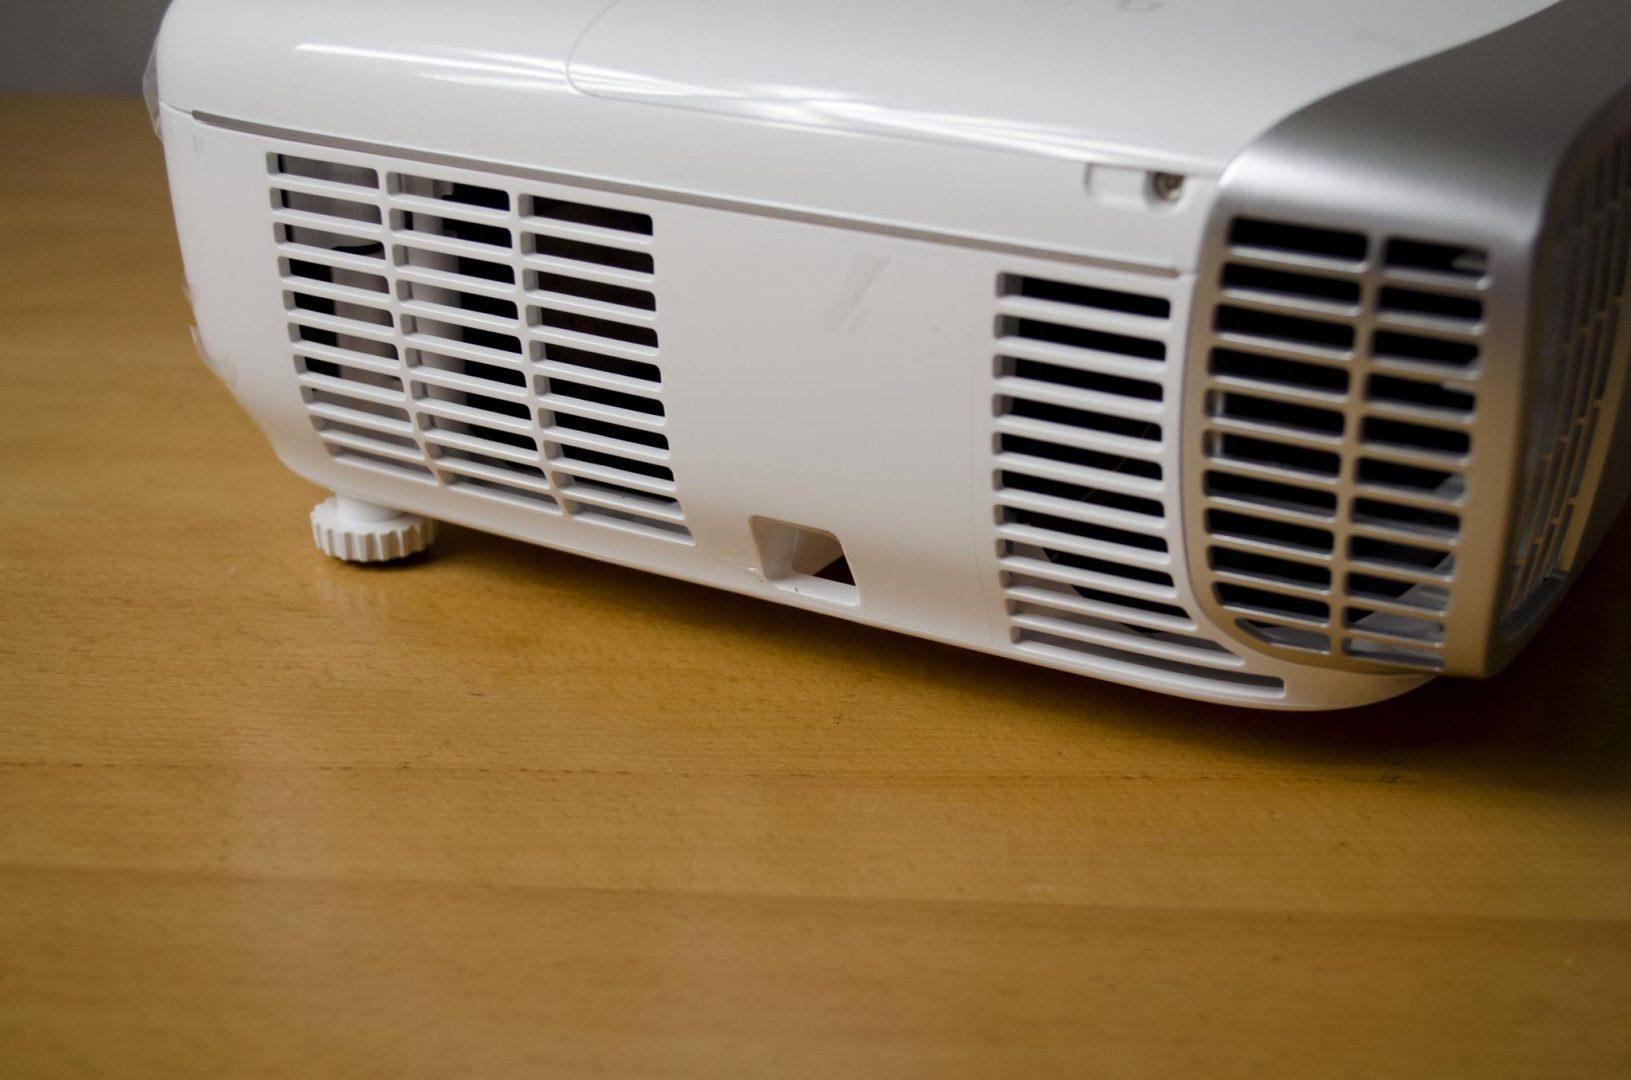 benq w1210st projector_5